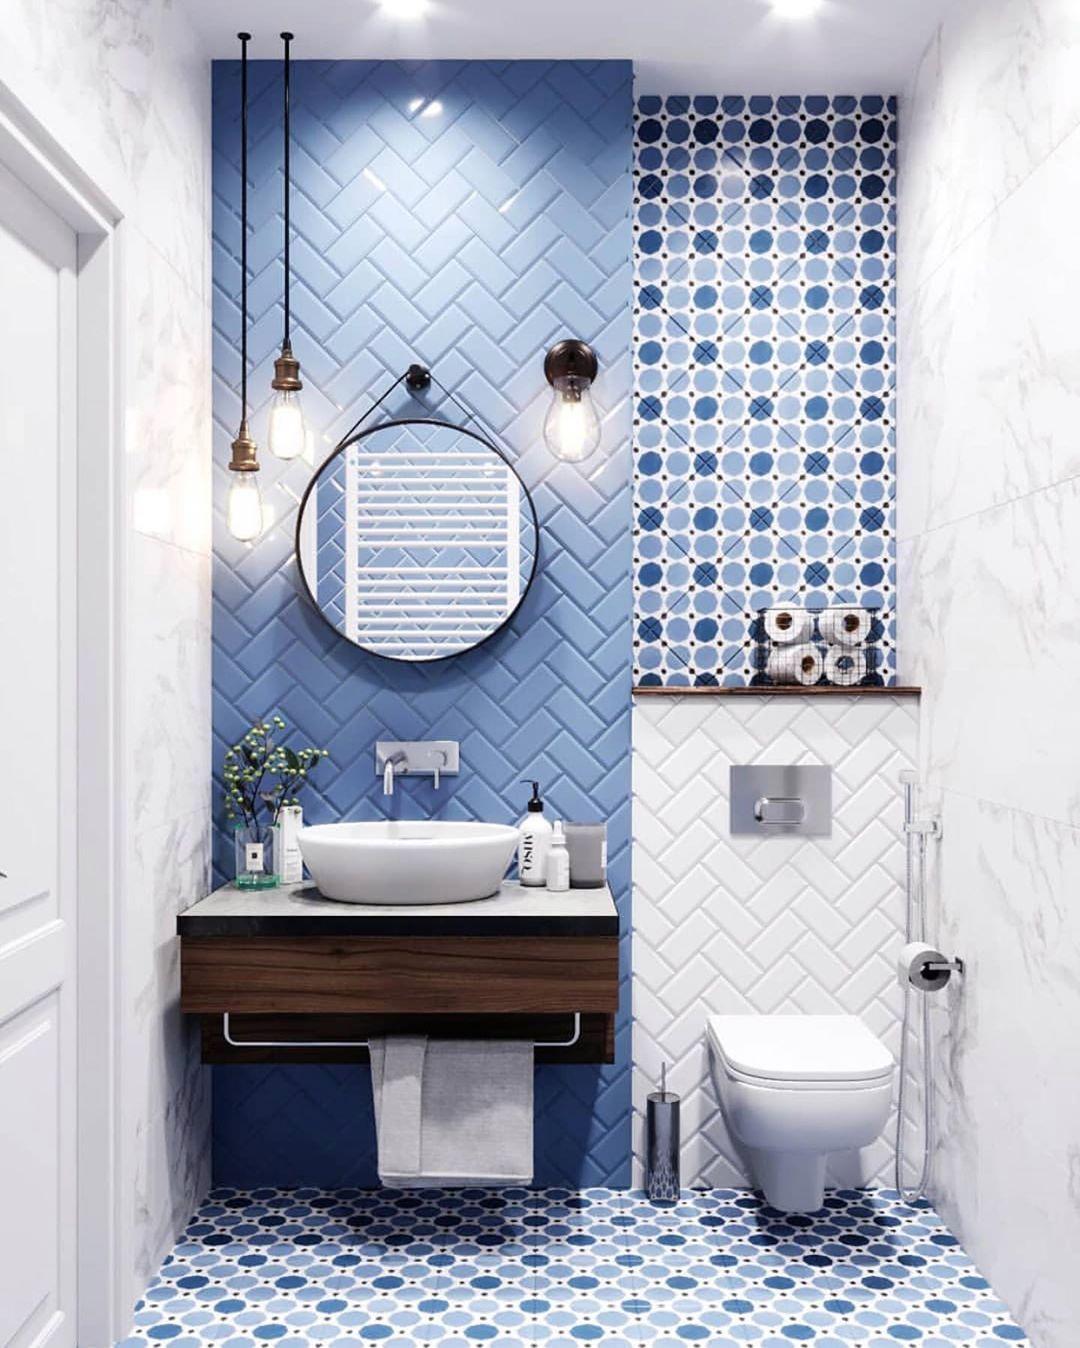 Dobroe Utrechko Sohranyajte Idei Sanuzlov V Zakladki Kakoj Vam Bolshe Nravitsya 1 2 Small Bathroom Makeover Bathroom Remodel Designs Bathroom Tile Designs